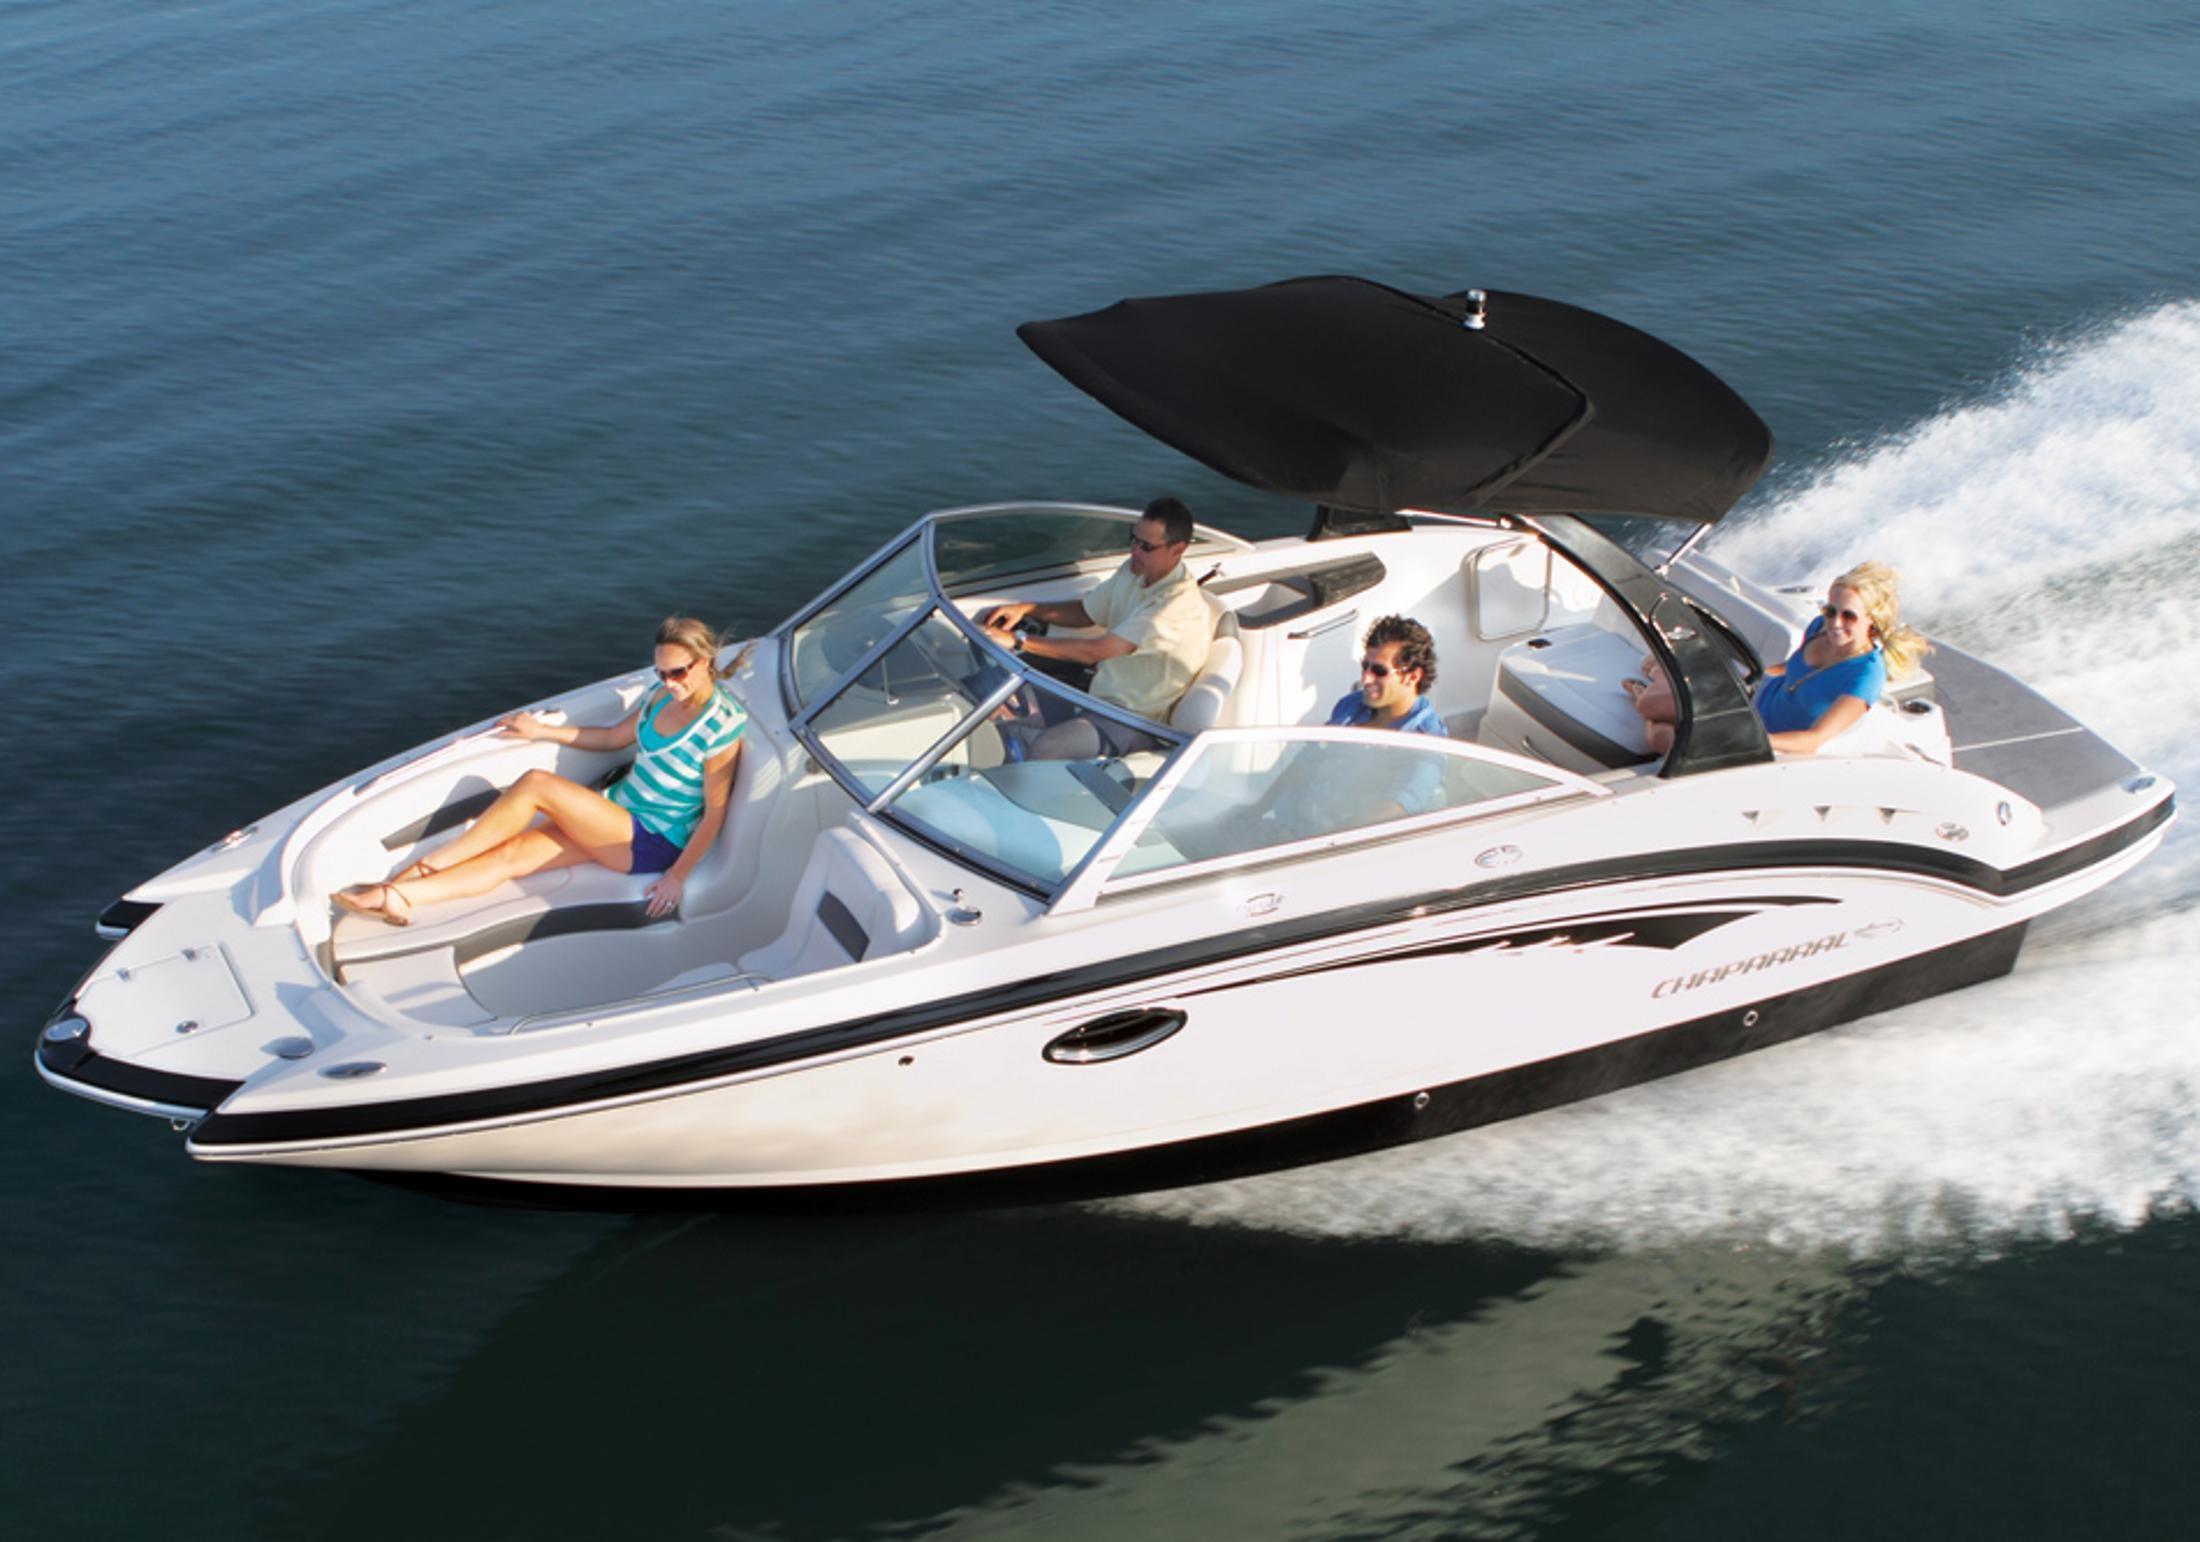 2017 Chaparral 244 Sunesta Power Boat For Sale Www